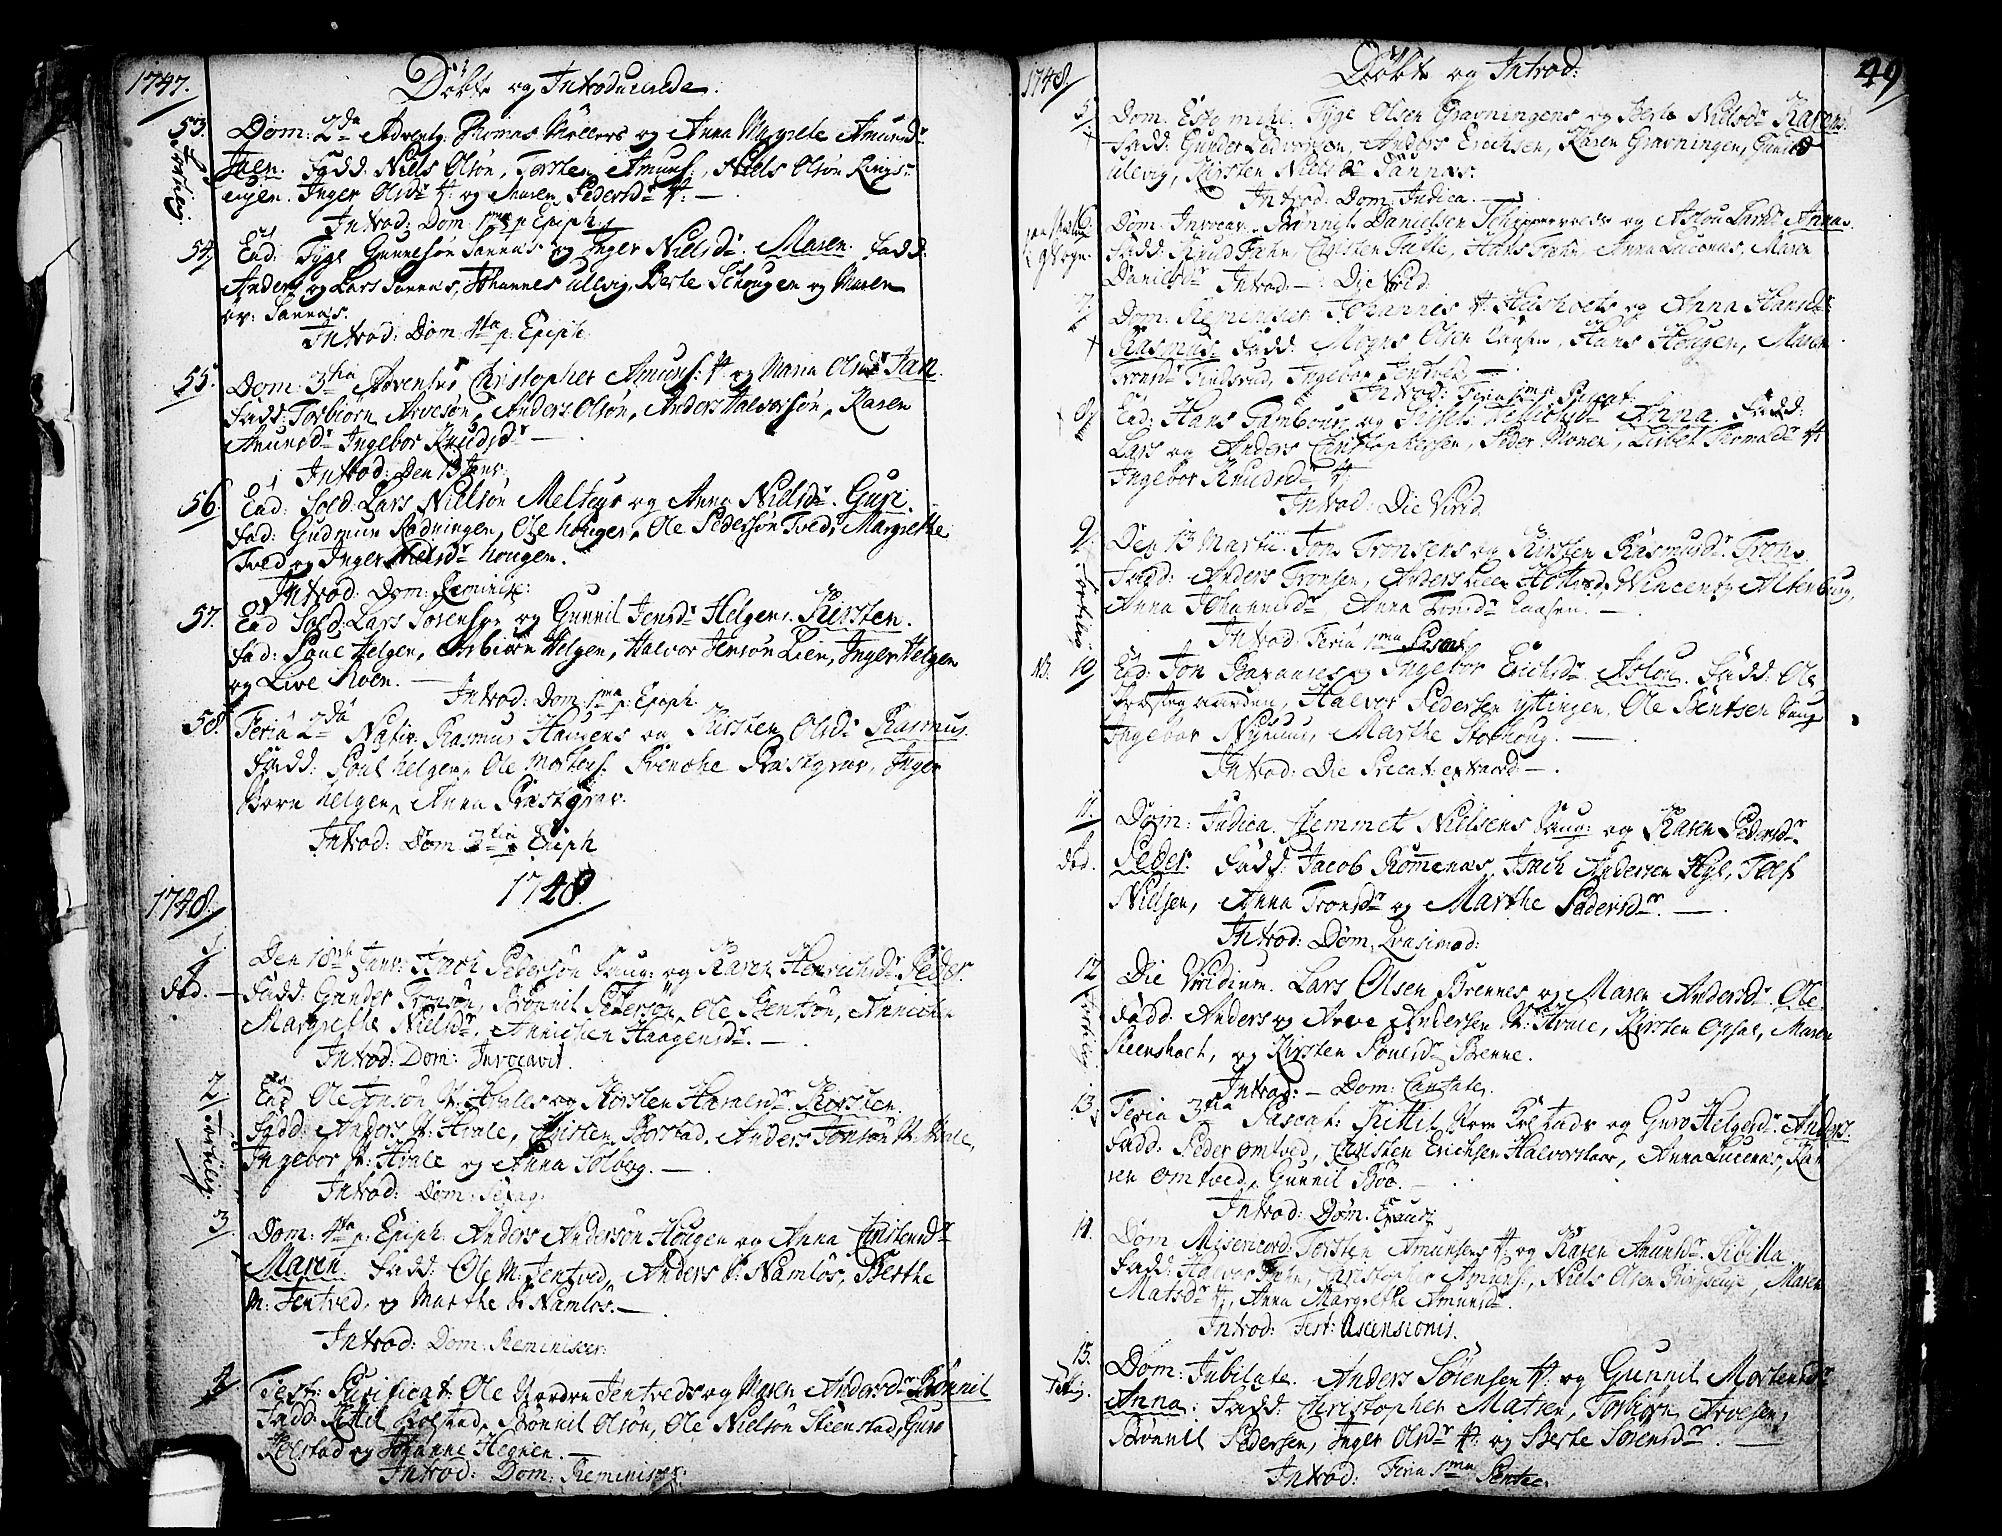 SAKO, Holla kirkebøker, F/Fa/L0001: Ministerialbok nr. 1, 1717-1779, s. 49